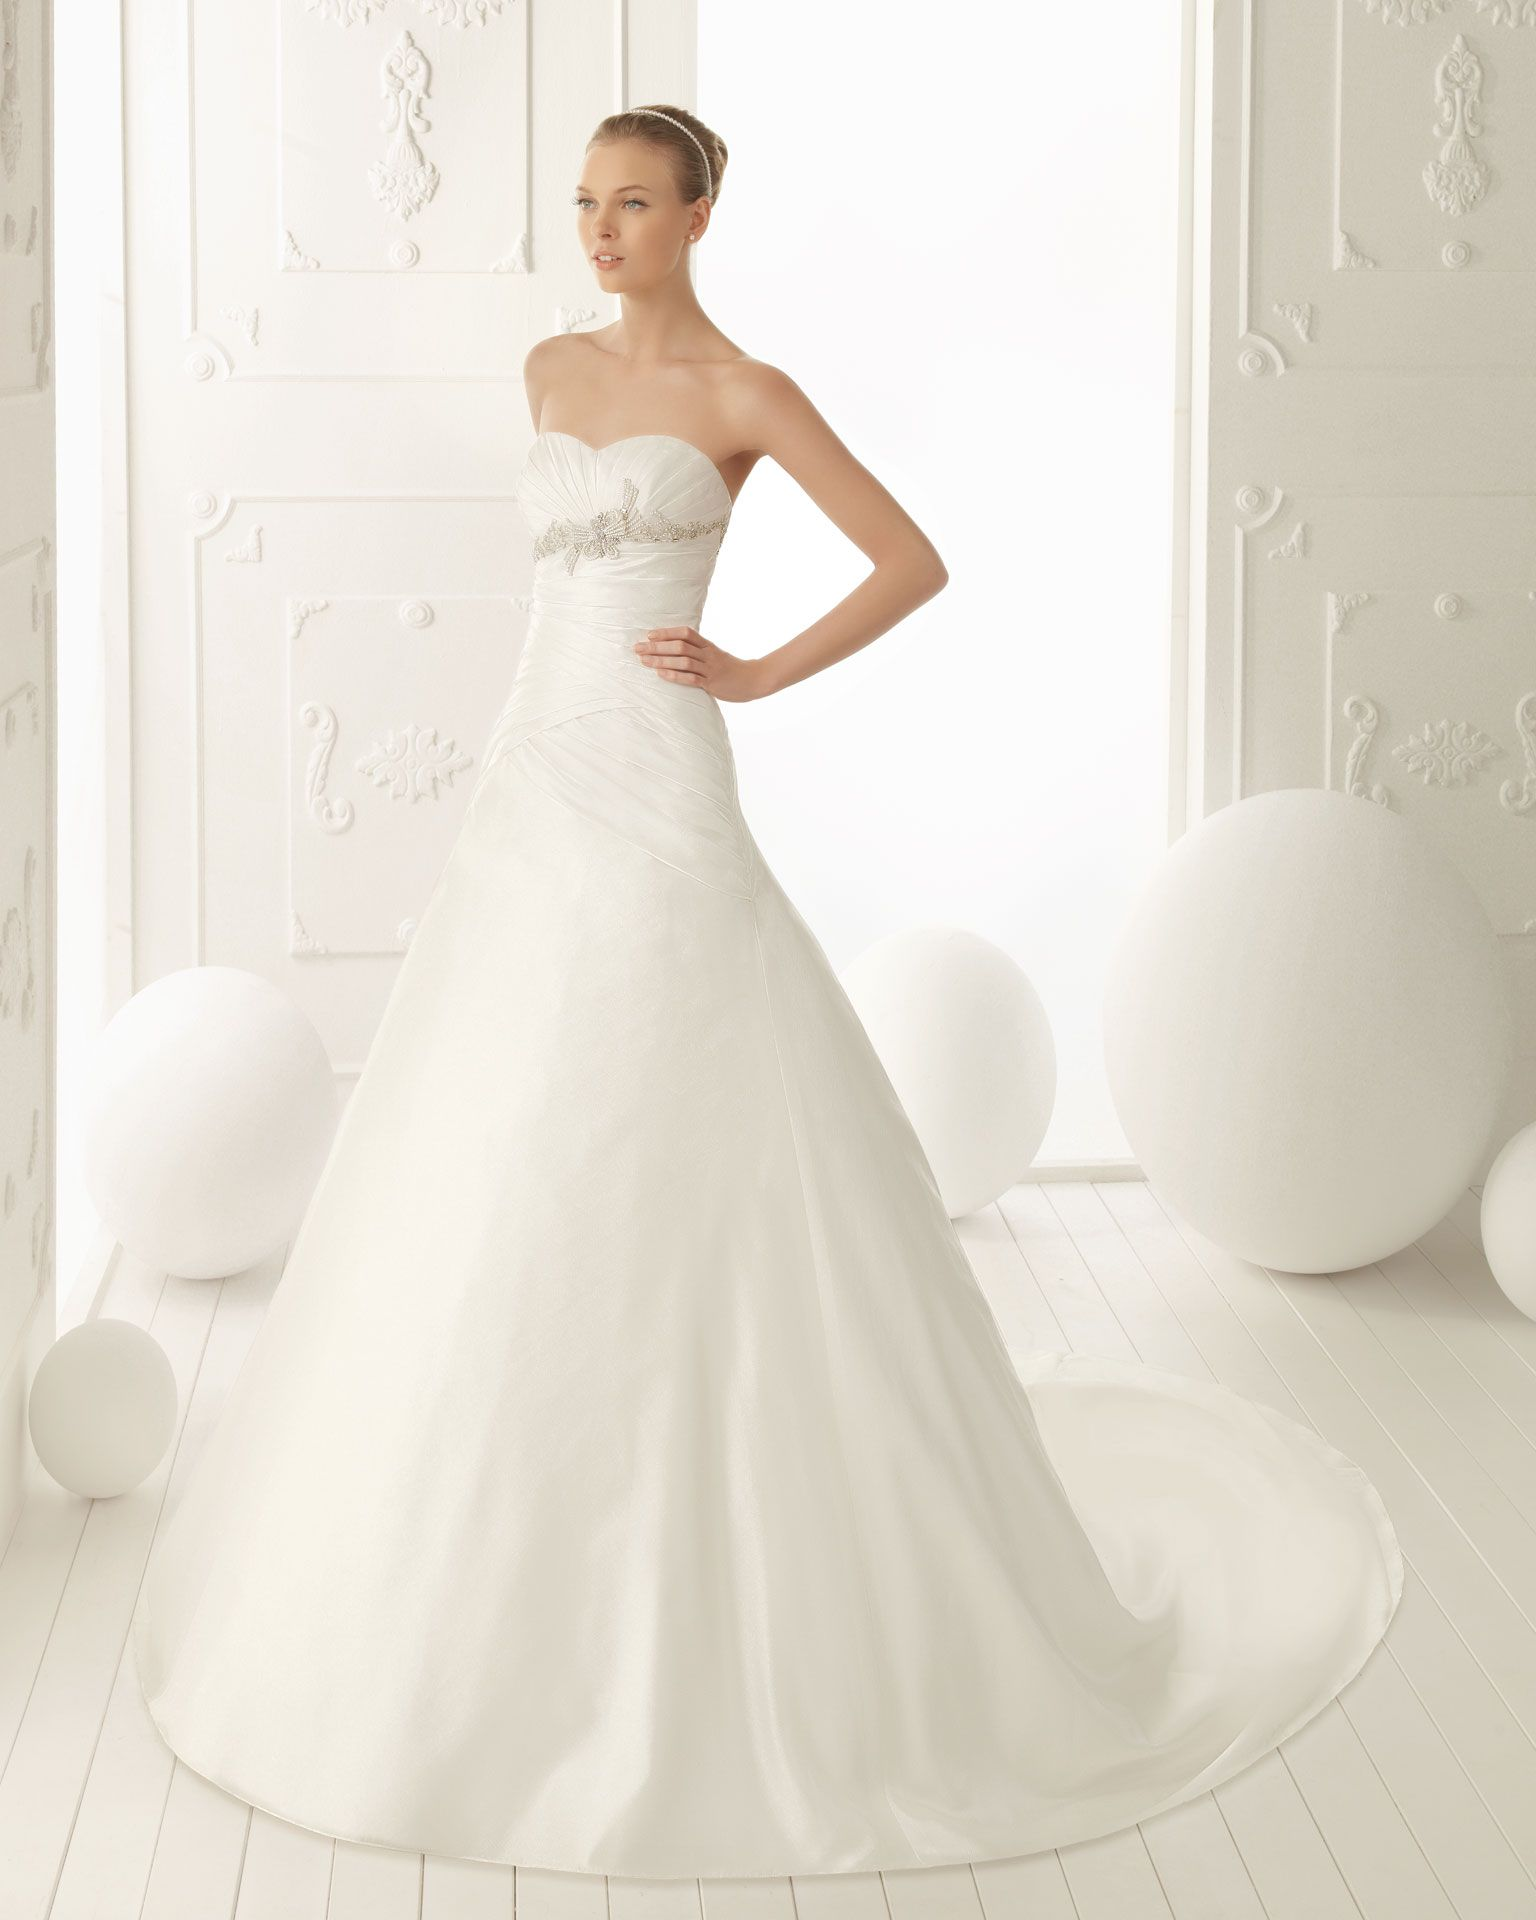 Ecru wedding dress  VELA  Beaded gazar dress with zip back in ecru T Pearl tiara in